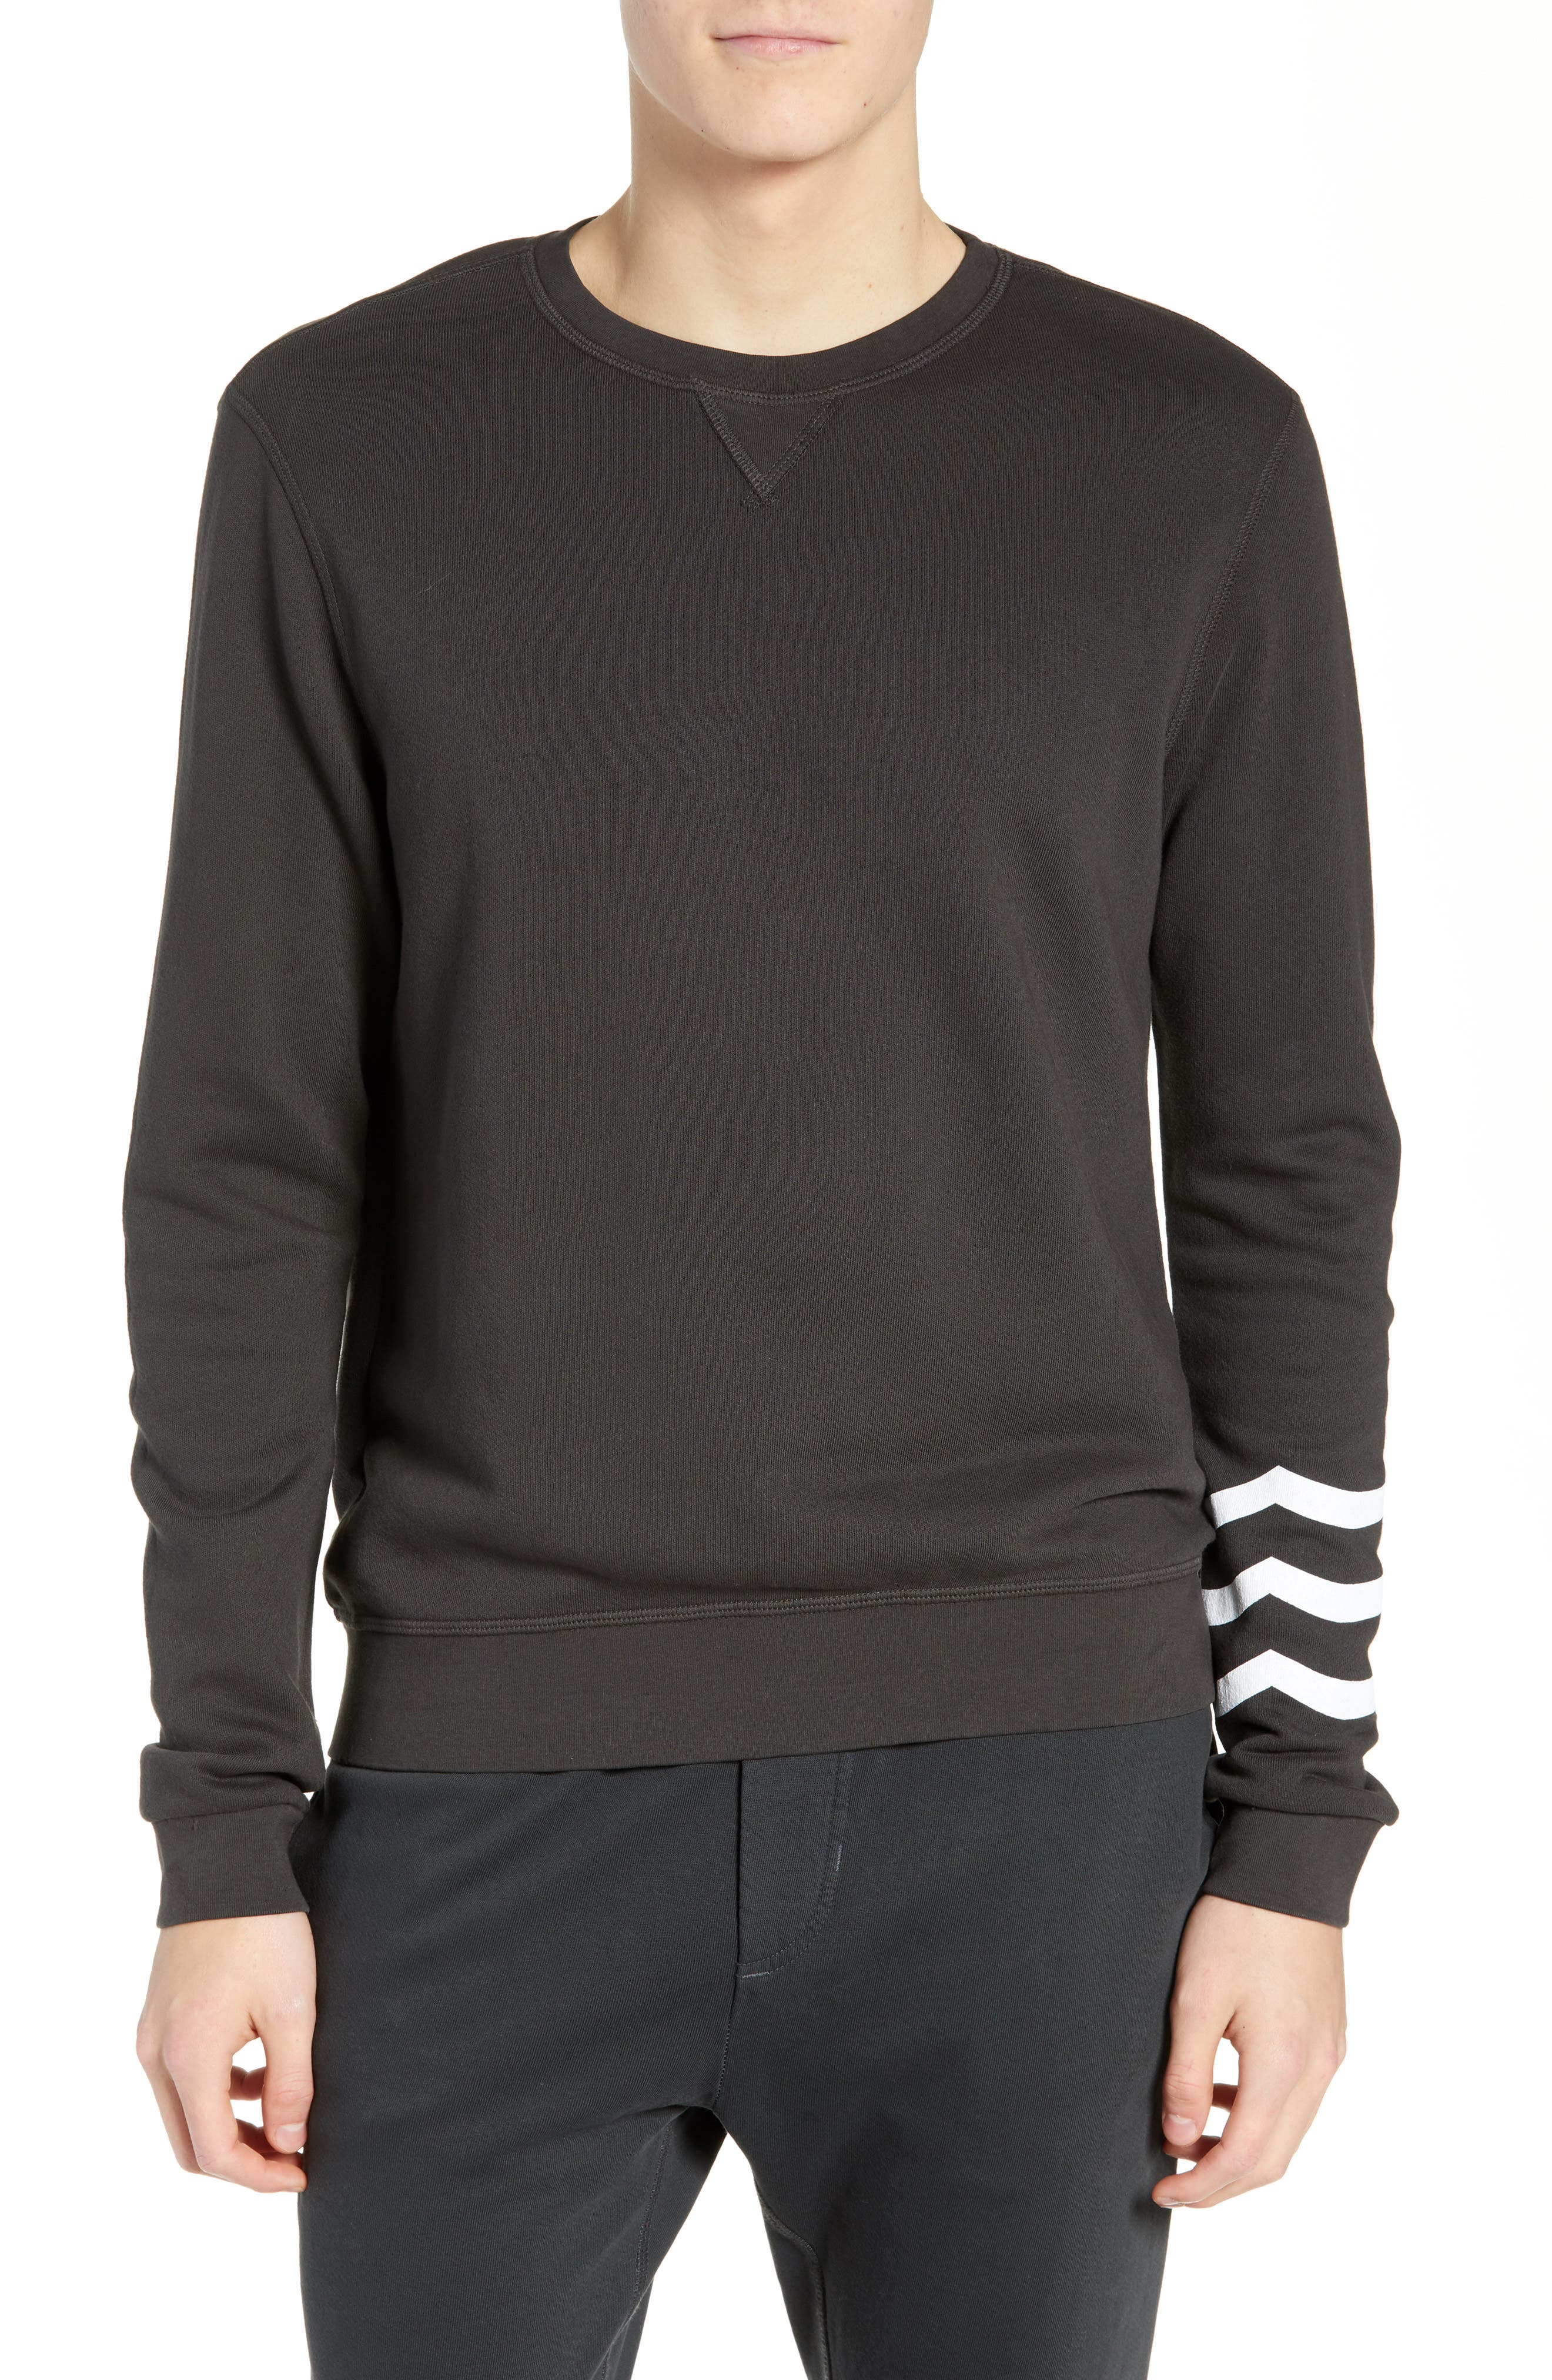 SOL ANGELES Essential Crewneck Sweatshirt in V Black